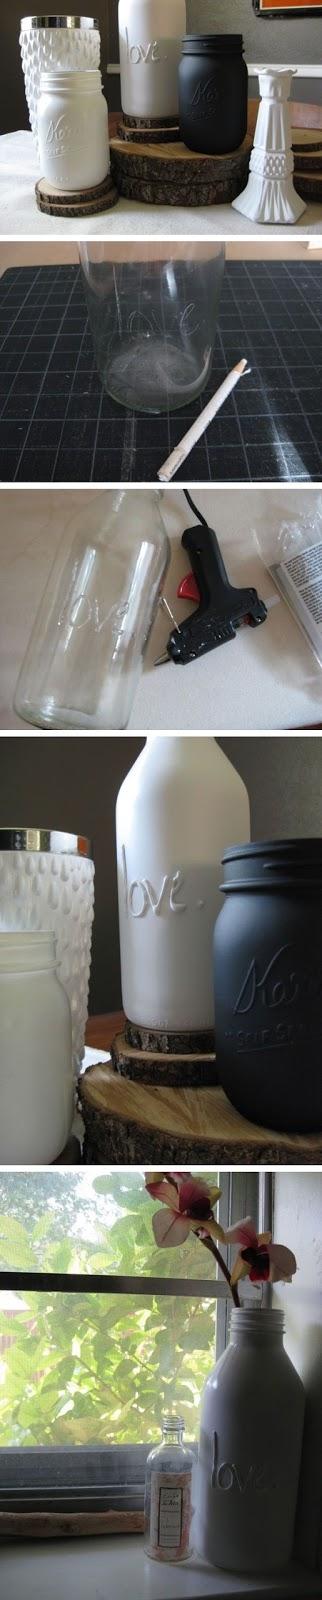 DIY botellas decorativas para tu hogar